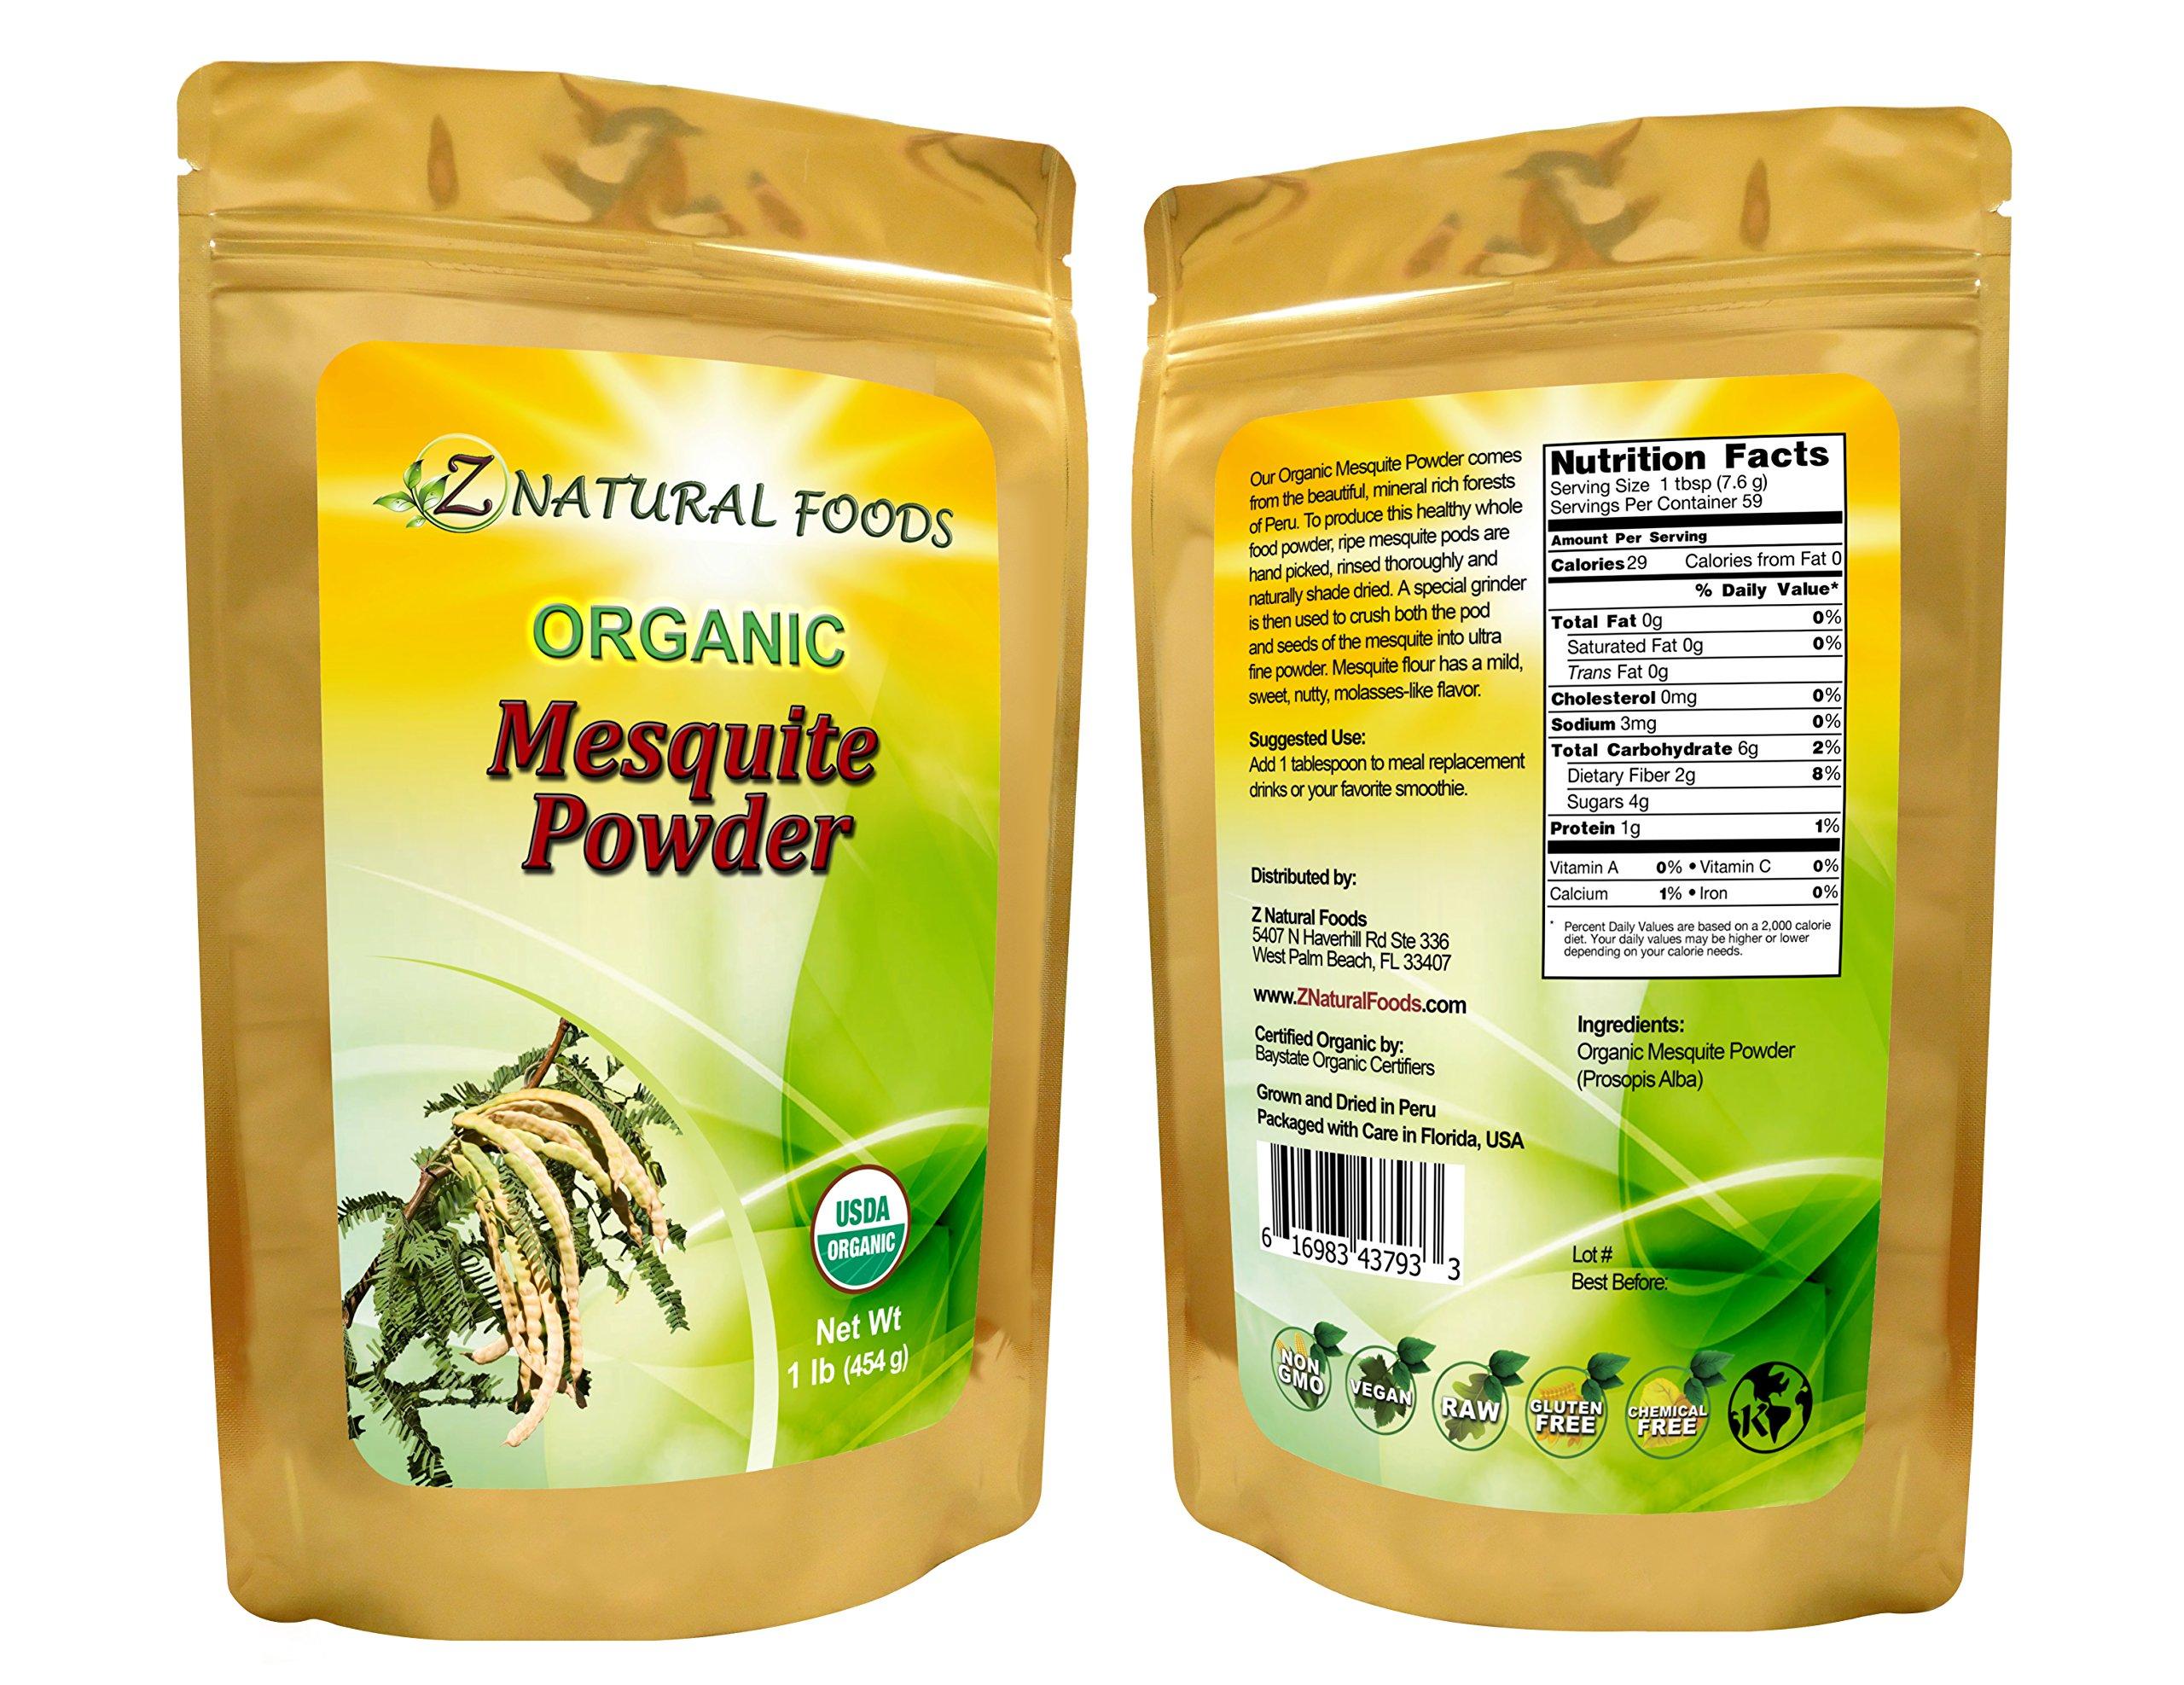 USDA Certified Organic Mesquite Powder (Flour) - All-natural, Fresh, Raw, Vegan, Non-GMO, Chemical-free (1 lb)